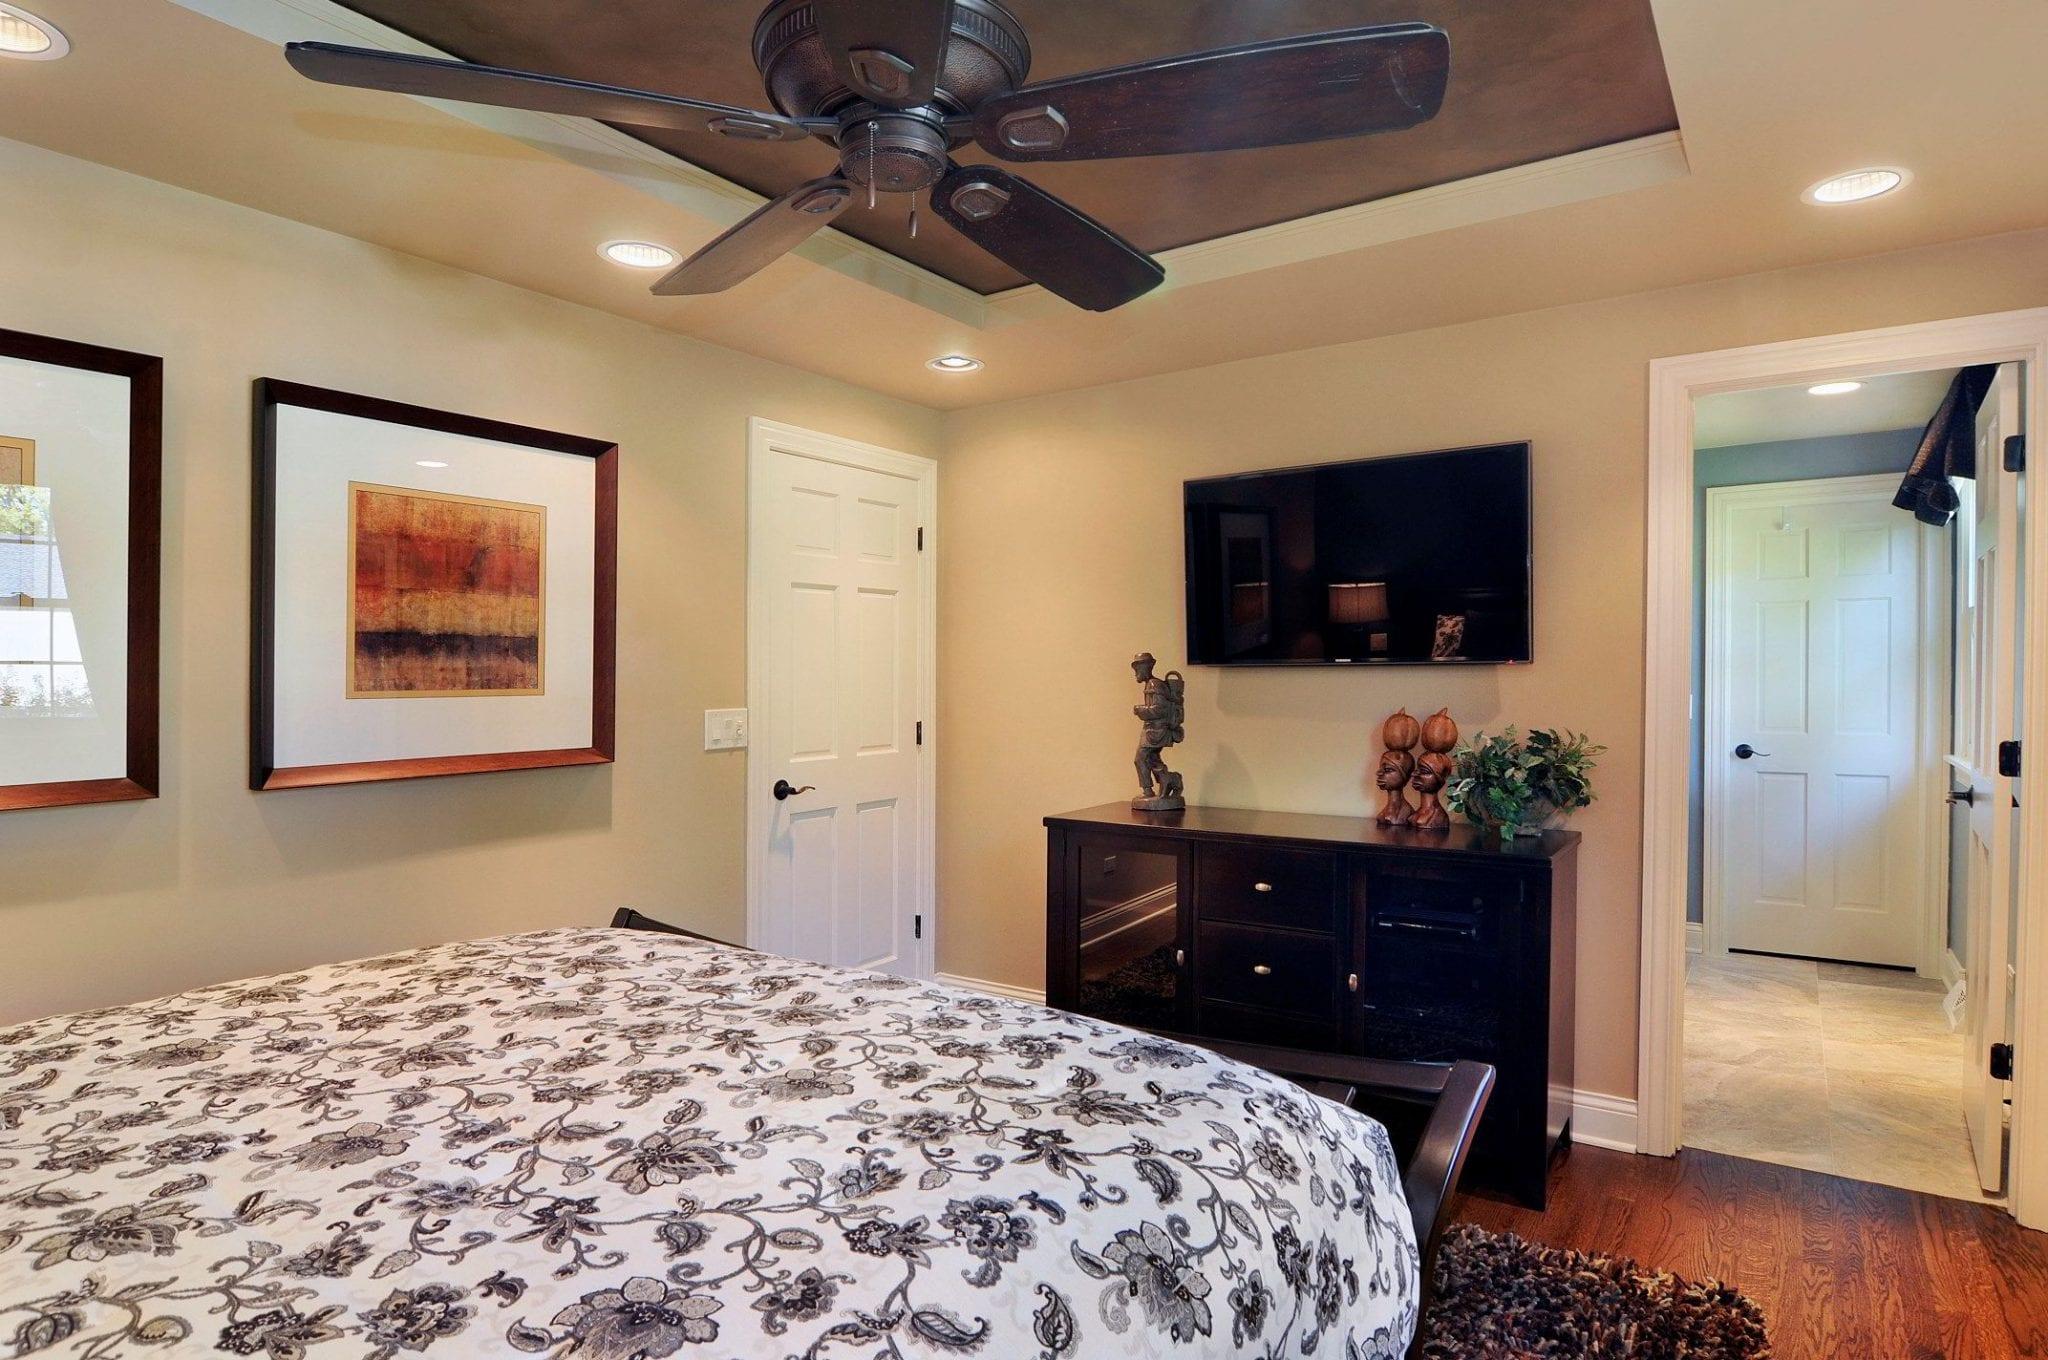 Master Bedroom Suite Design by Illinois Dennis Frankowski of DF Design, Inc.